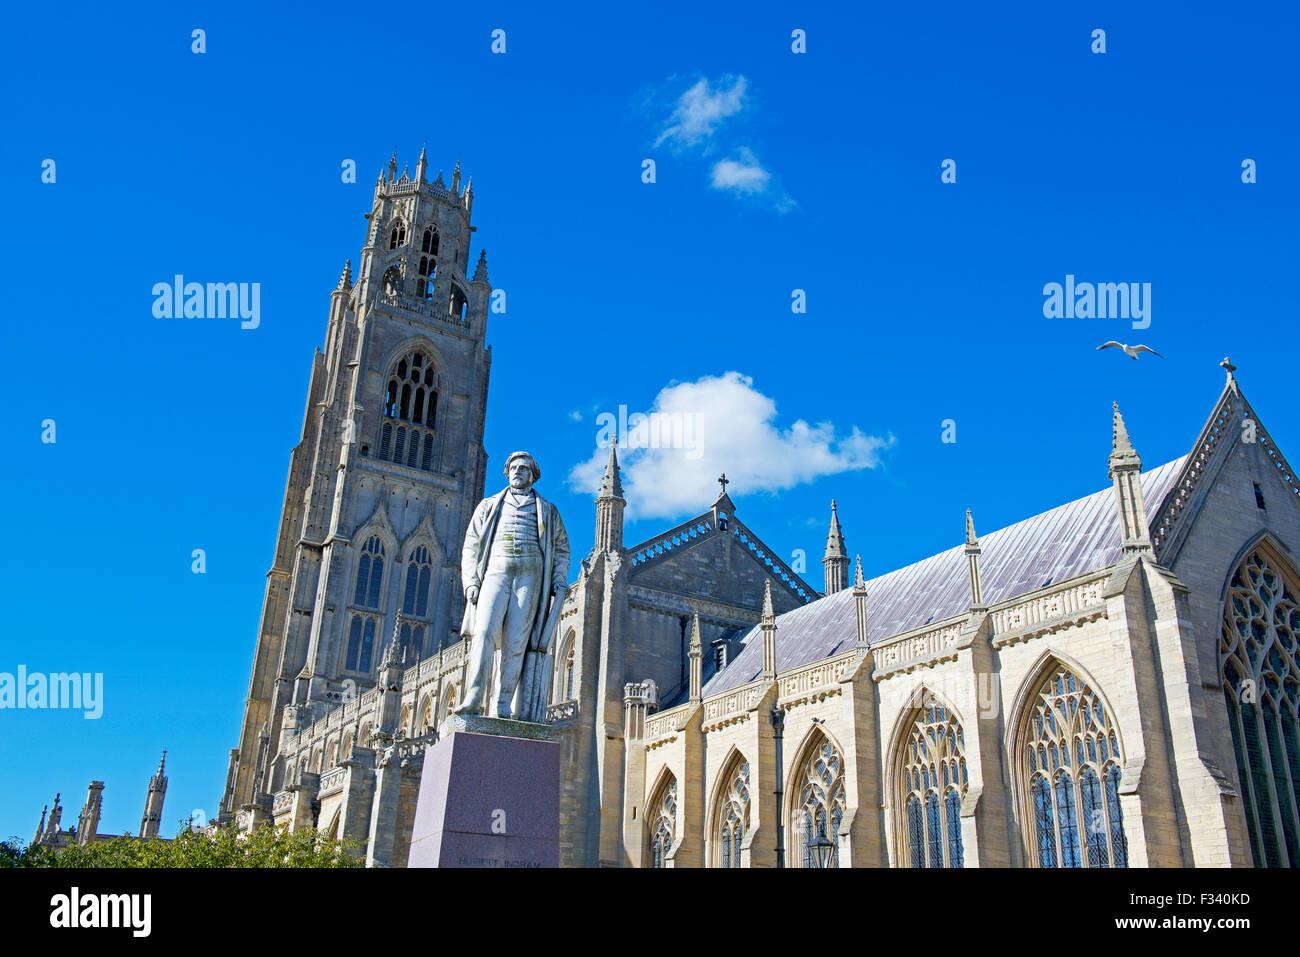 La iglesia de St Botolph, y estatua de Herbert Ingram, Boston, Lincolnshire, Inglaterra Imagen De Stock